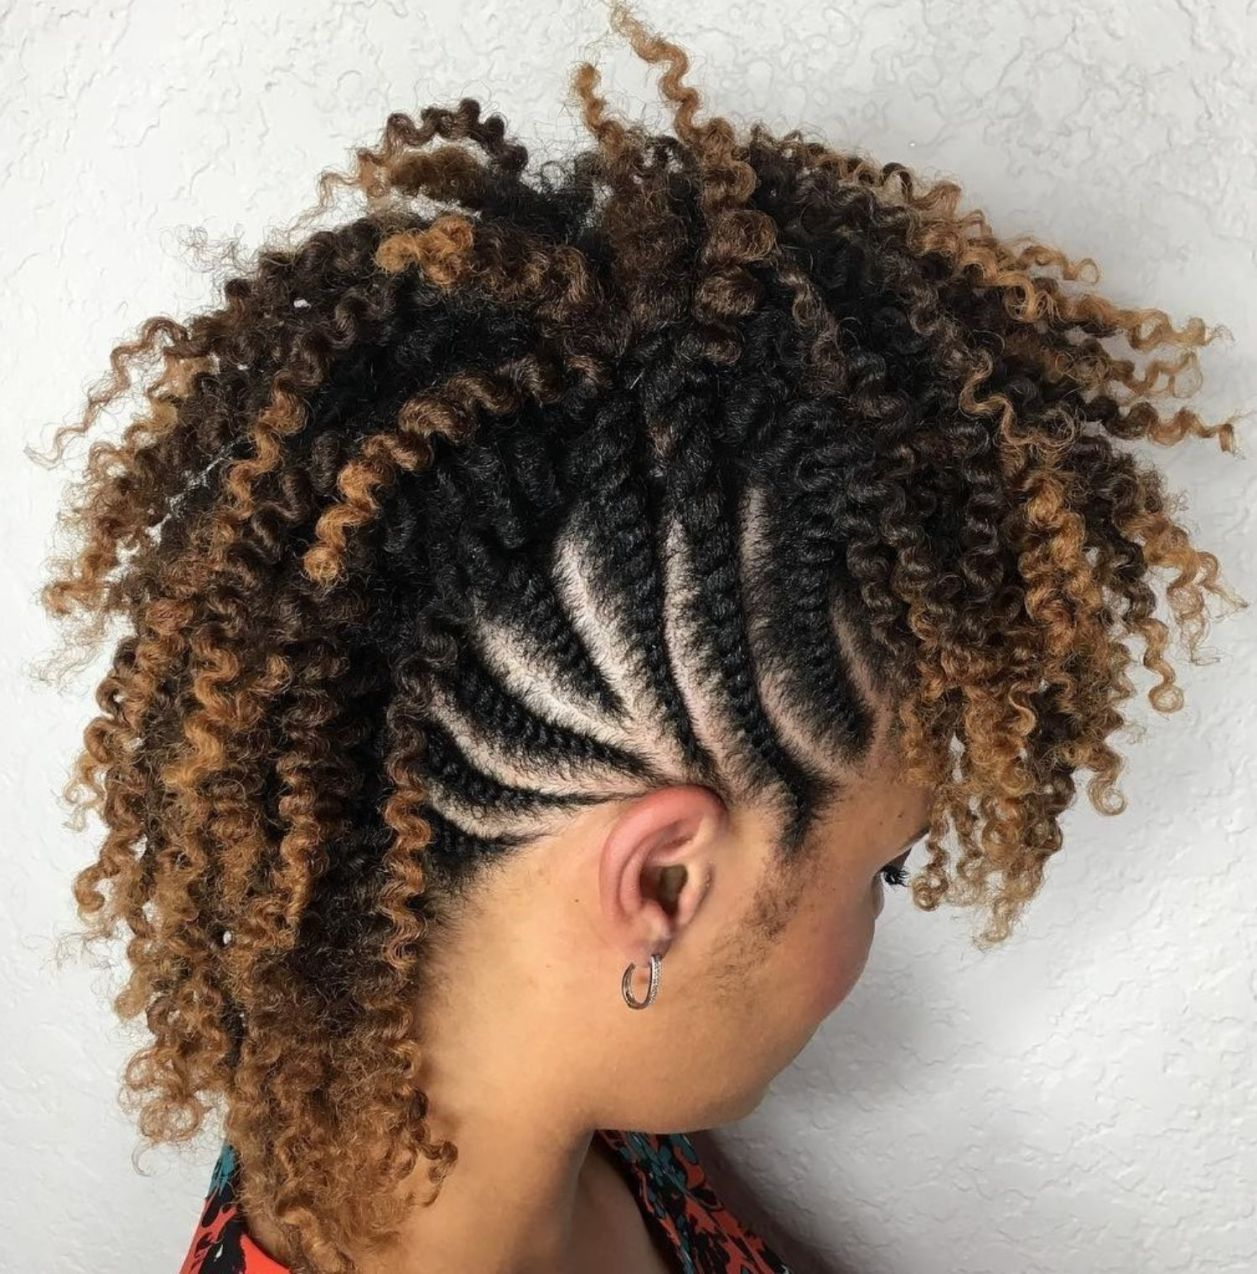 70 Best Black Braided Hairstyles That Turn Heads Braided Mohawk Hairstyles Hair Styles Braided Hairstyles